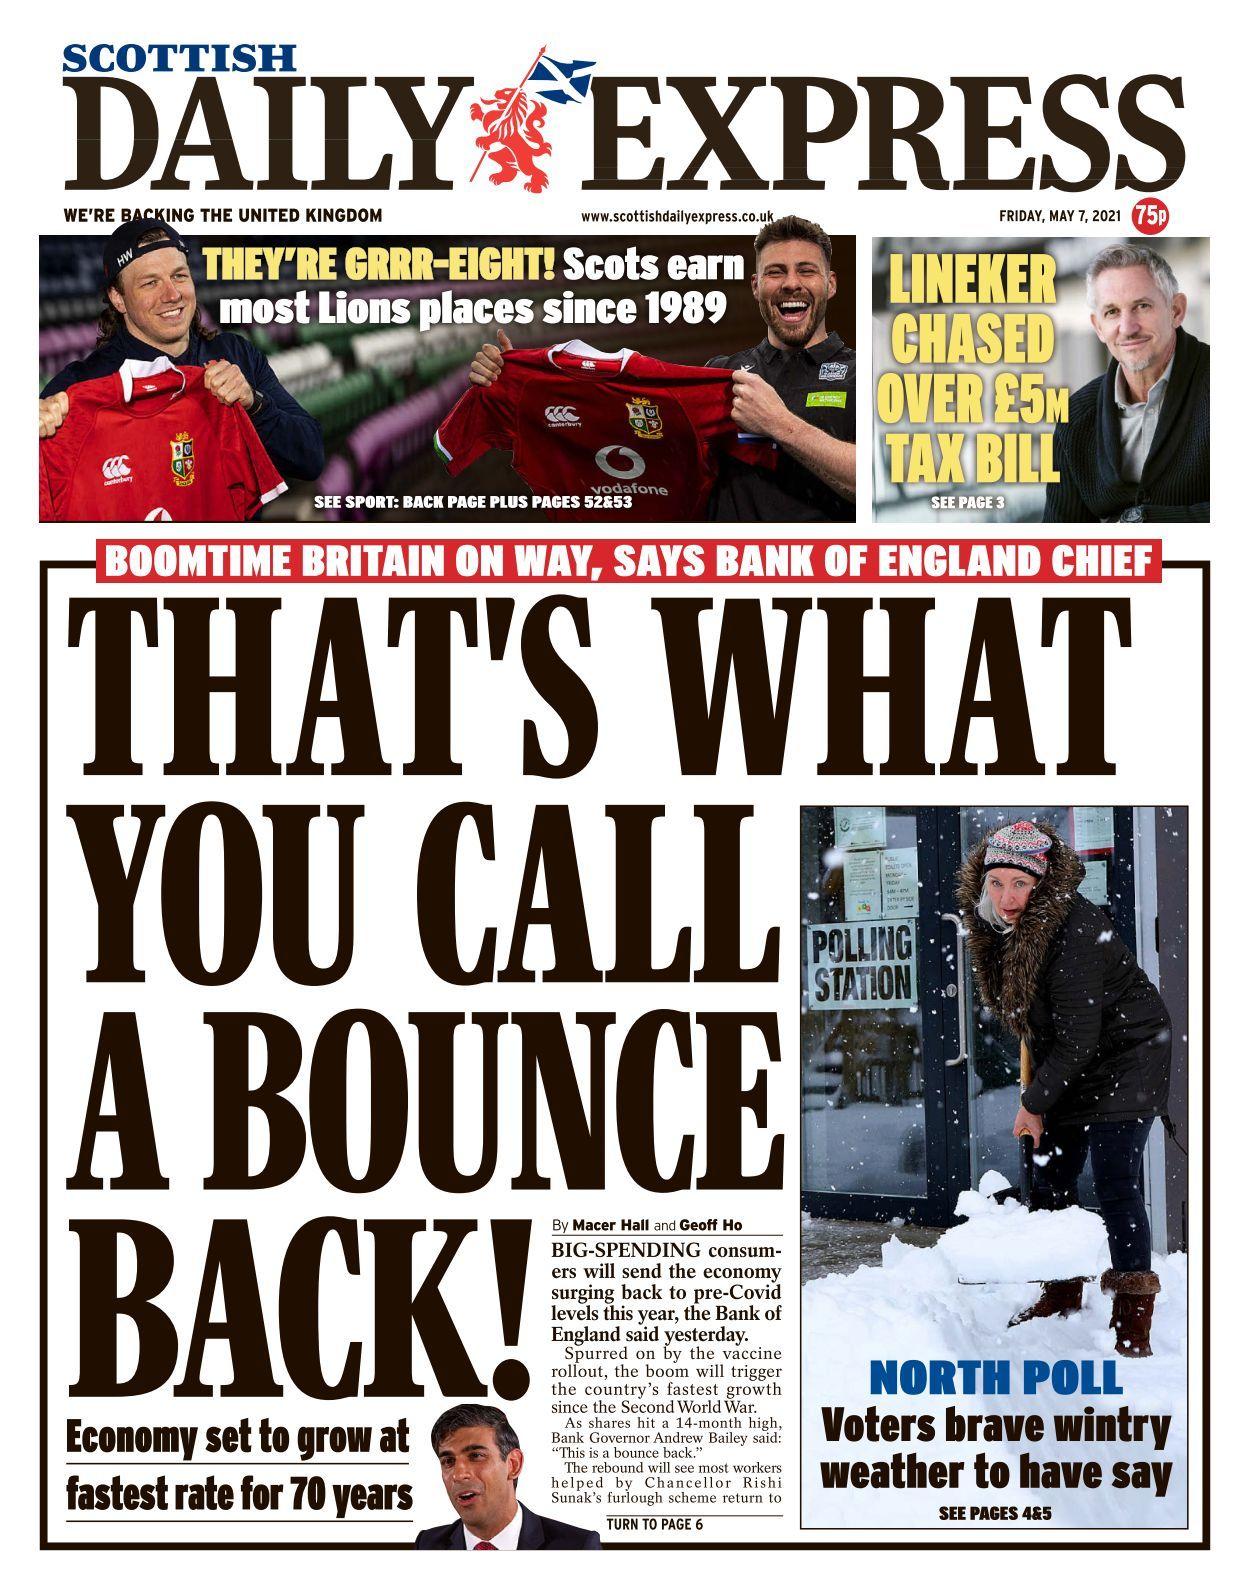 Scottish Daily Express - 15-15-15